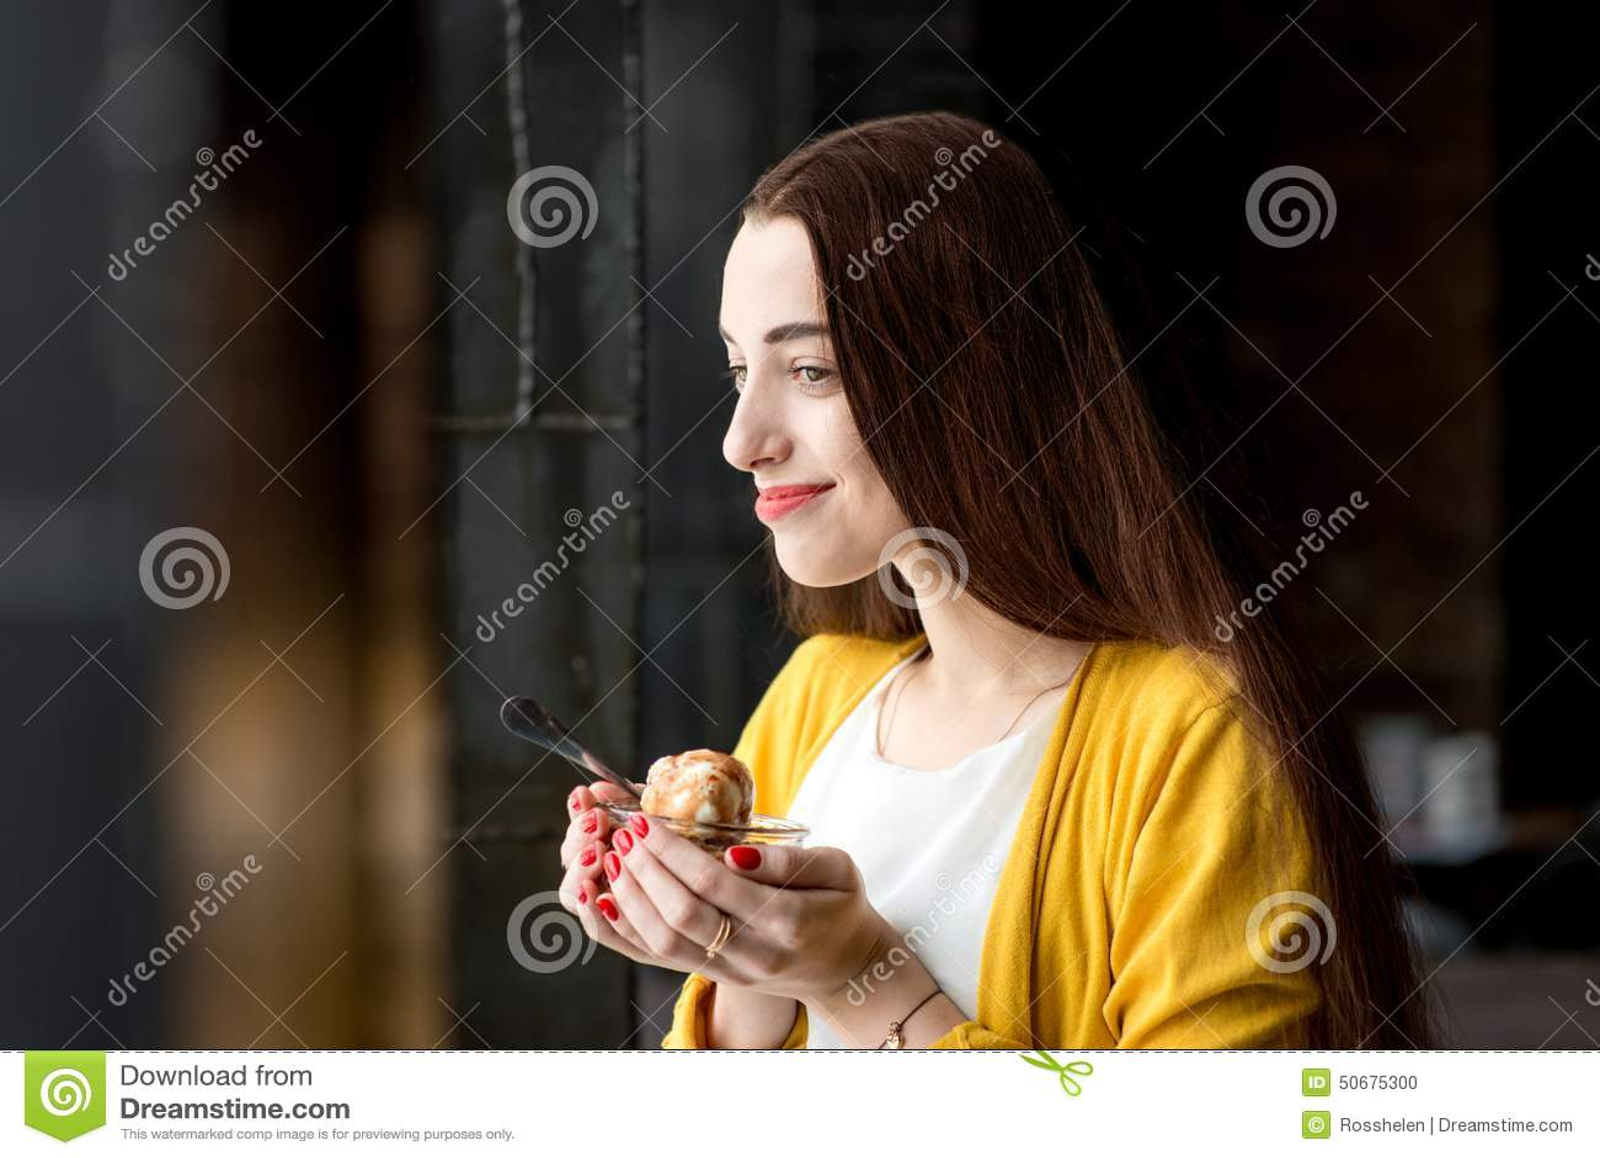 Download 吃在咖啡馆的妇女冰淇凌 库存照片. 图片 包括有 套头衫, 办公室, 咖啡馆, 毛线衣, 成人, 创造性 - 50675300